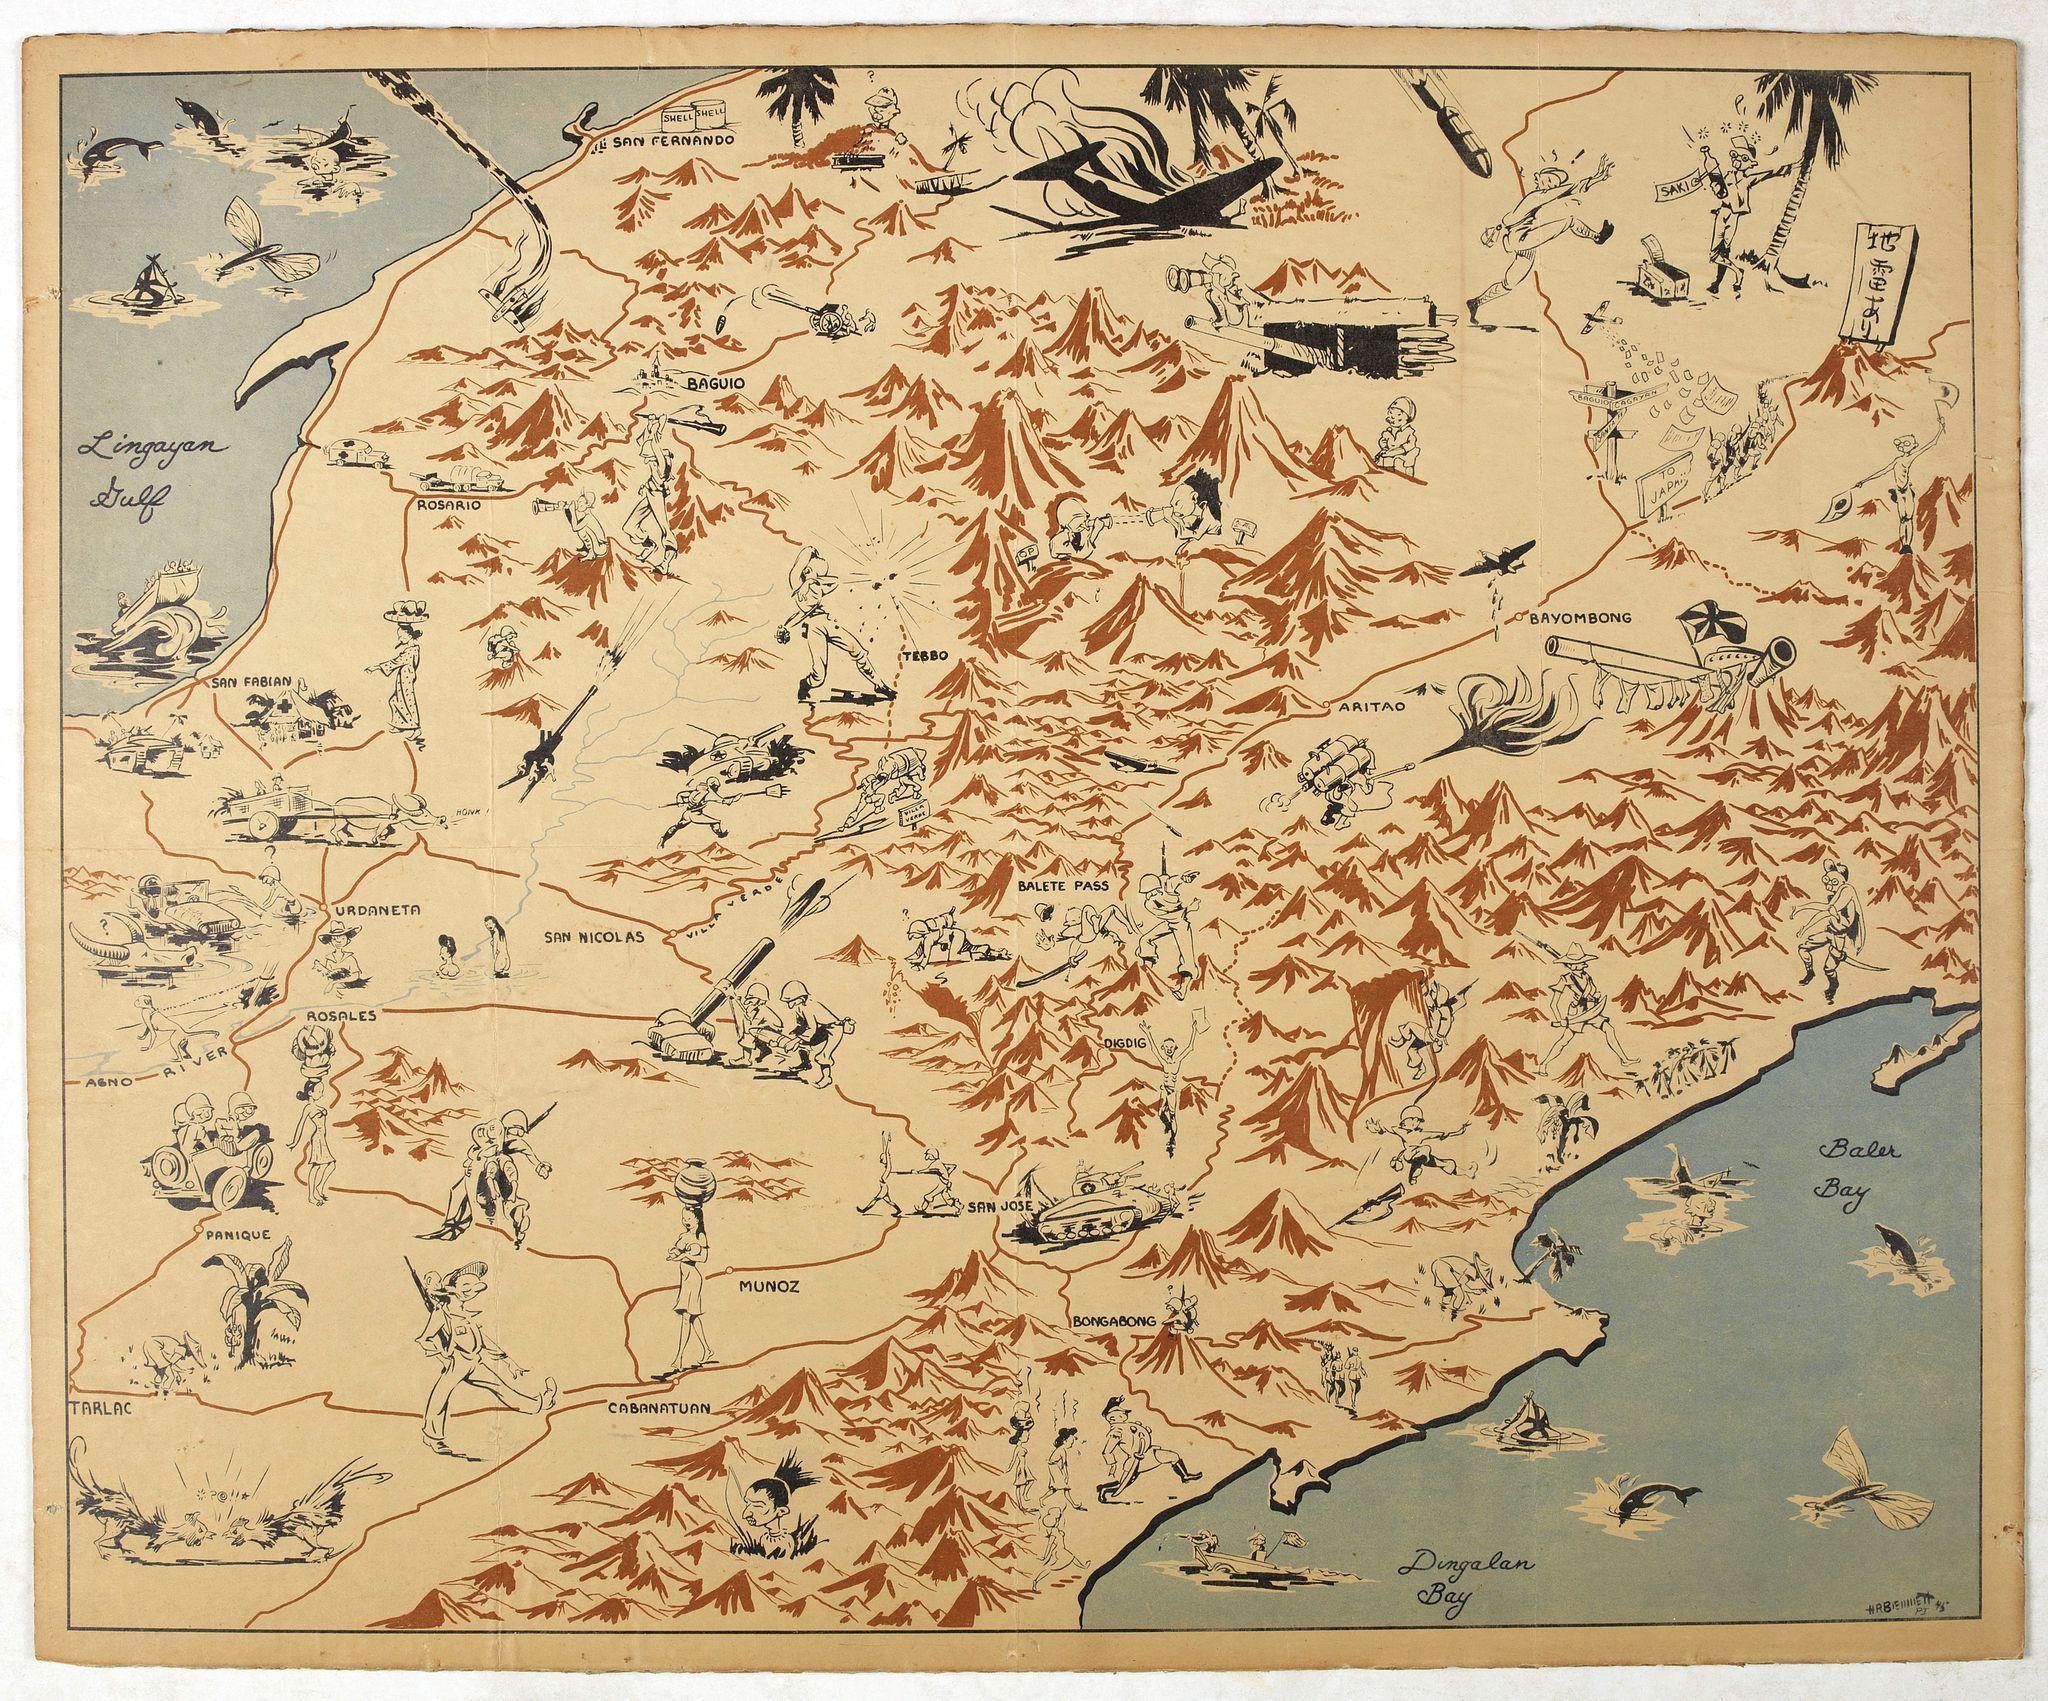 BIENNETT -  [ Pictorial map of the Philippine battlefield ]